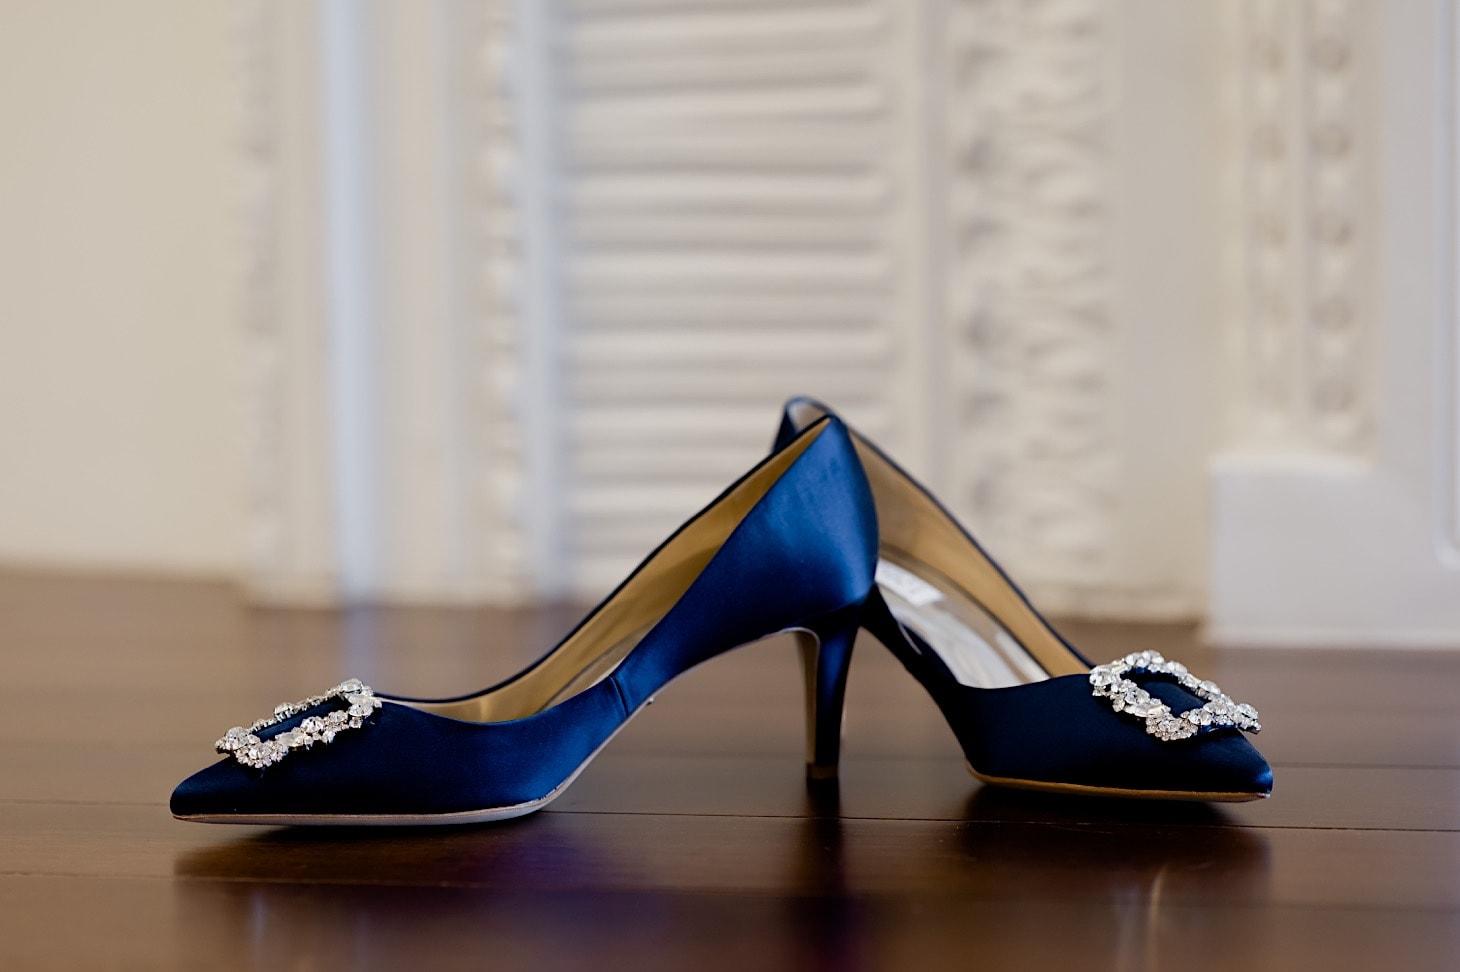 Bridal Shoes at Des Moines Tea Room